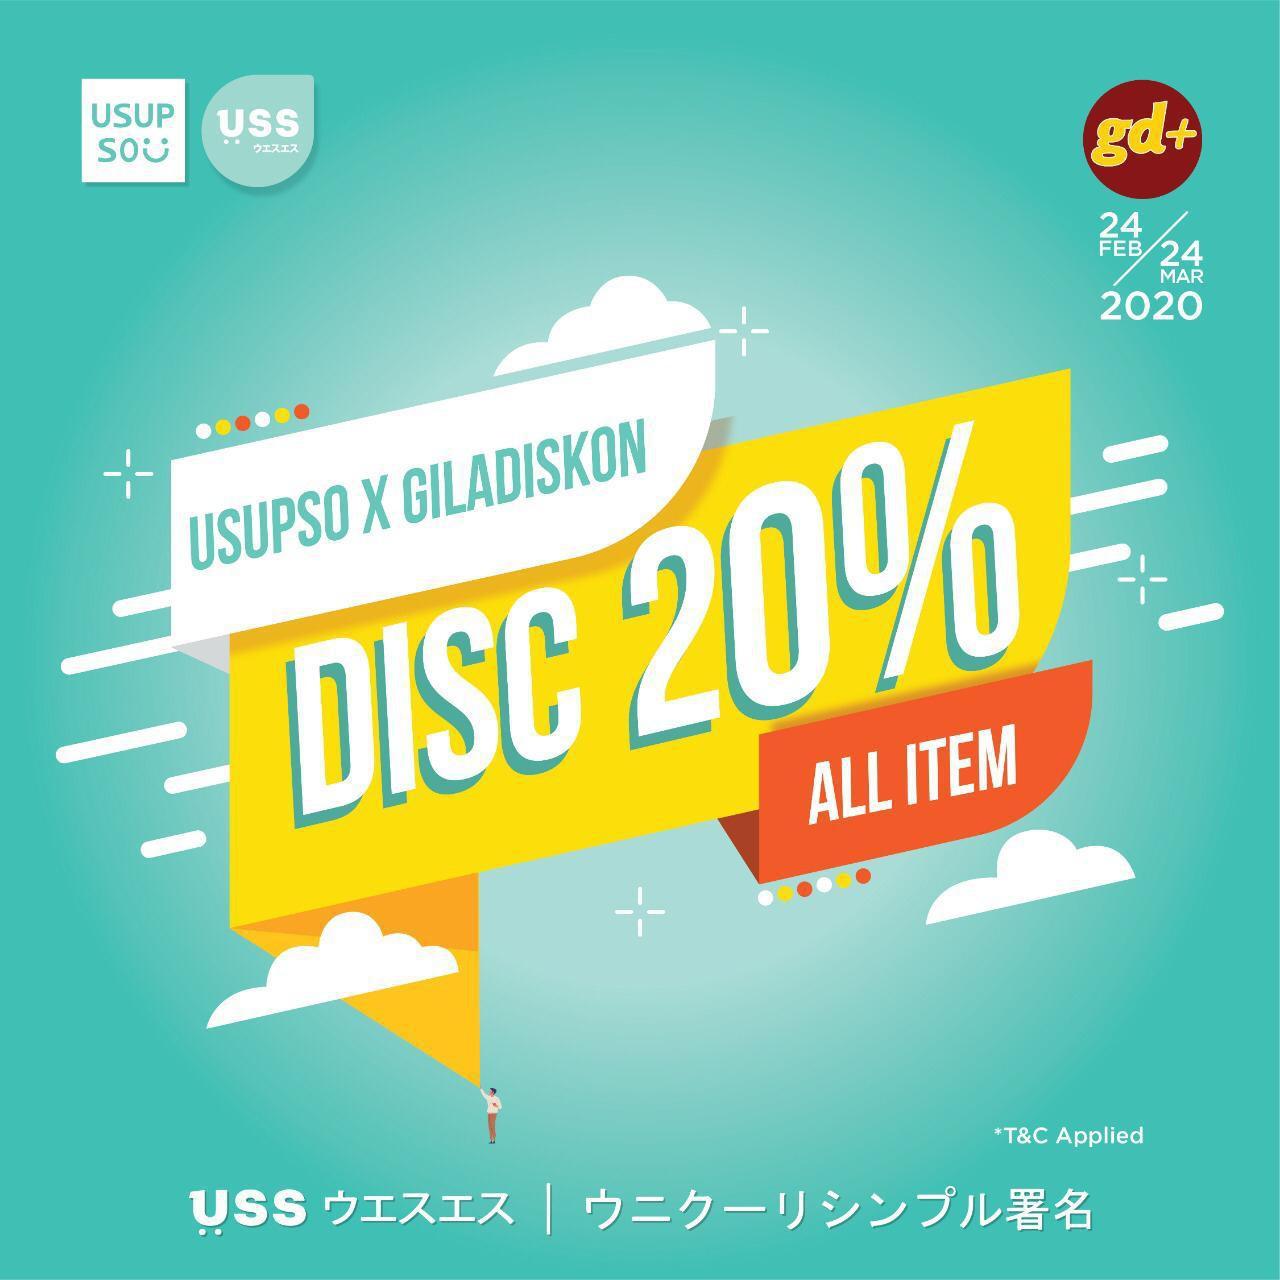 Usupso Promo All Items Diskon 20% OFF!